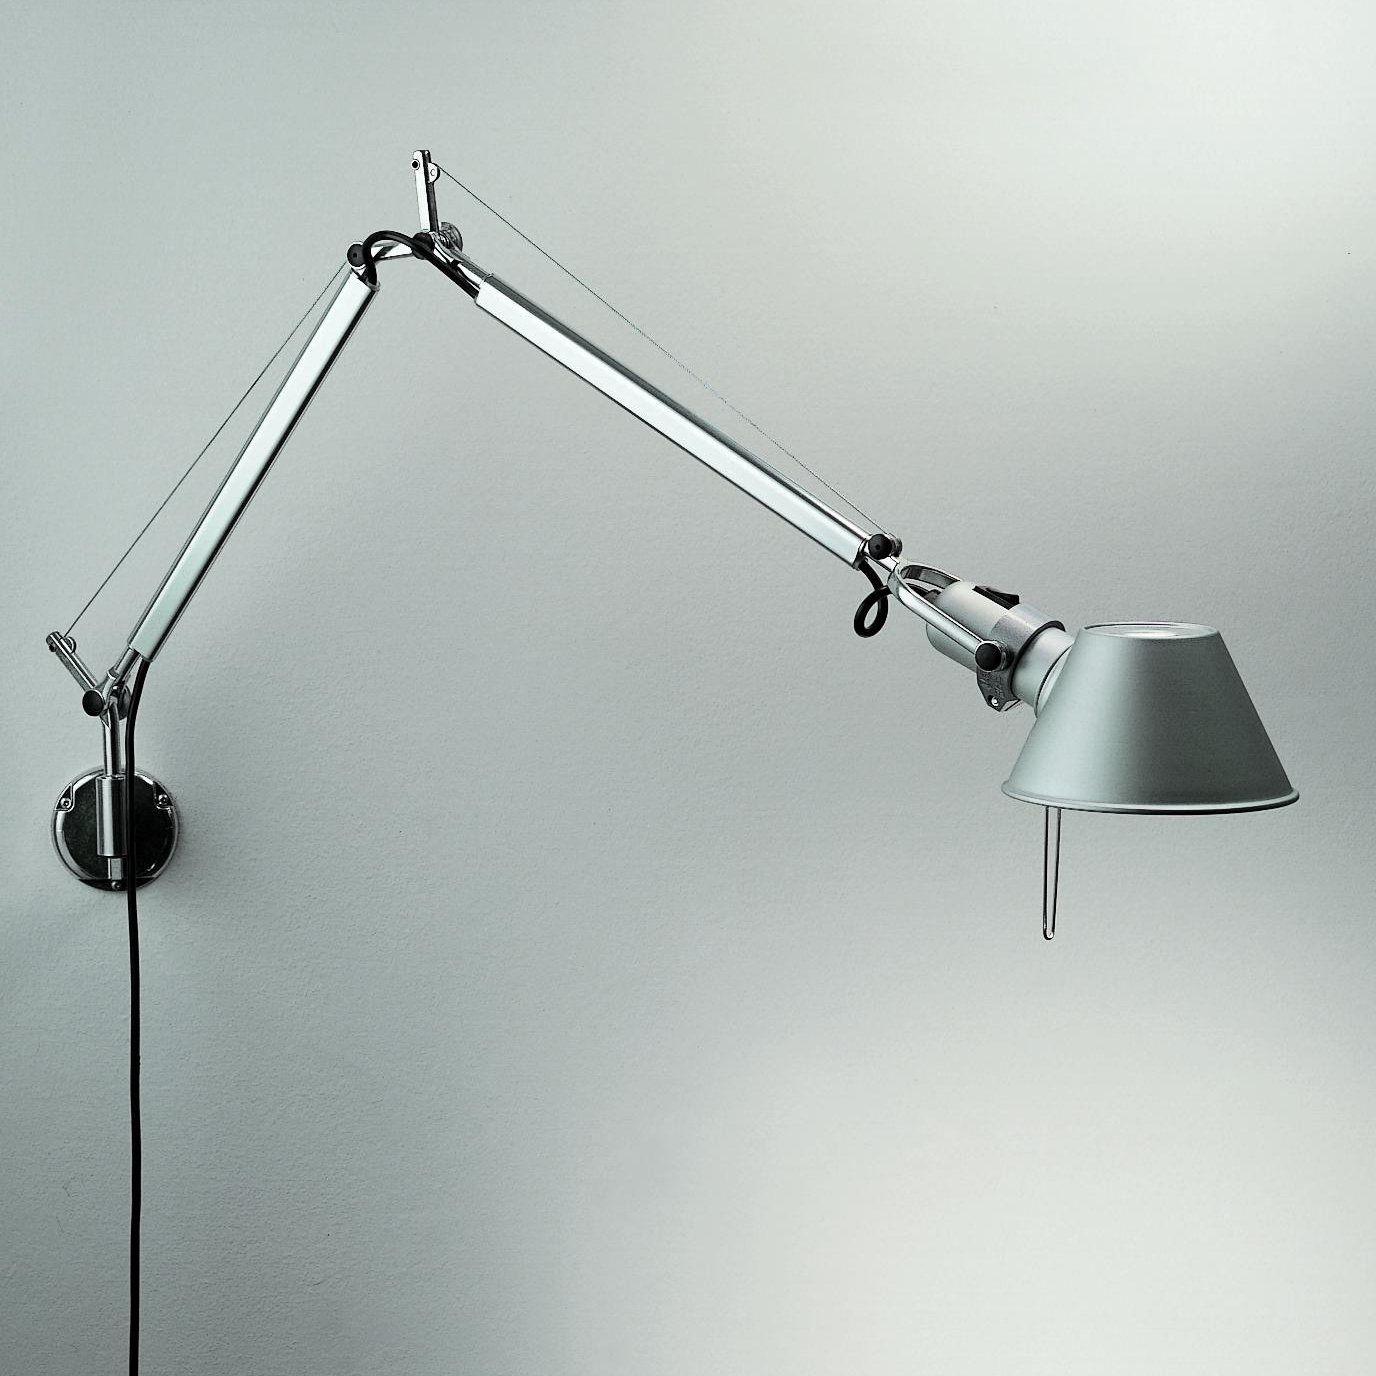 Wall Mountable Desk Lamp